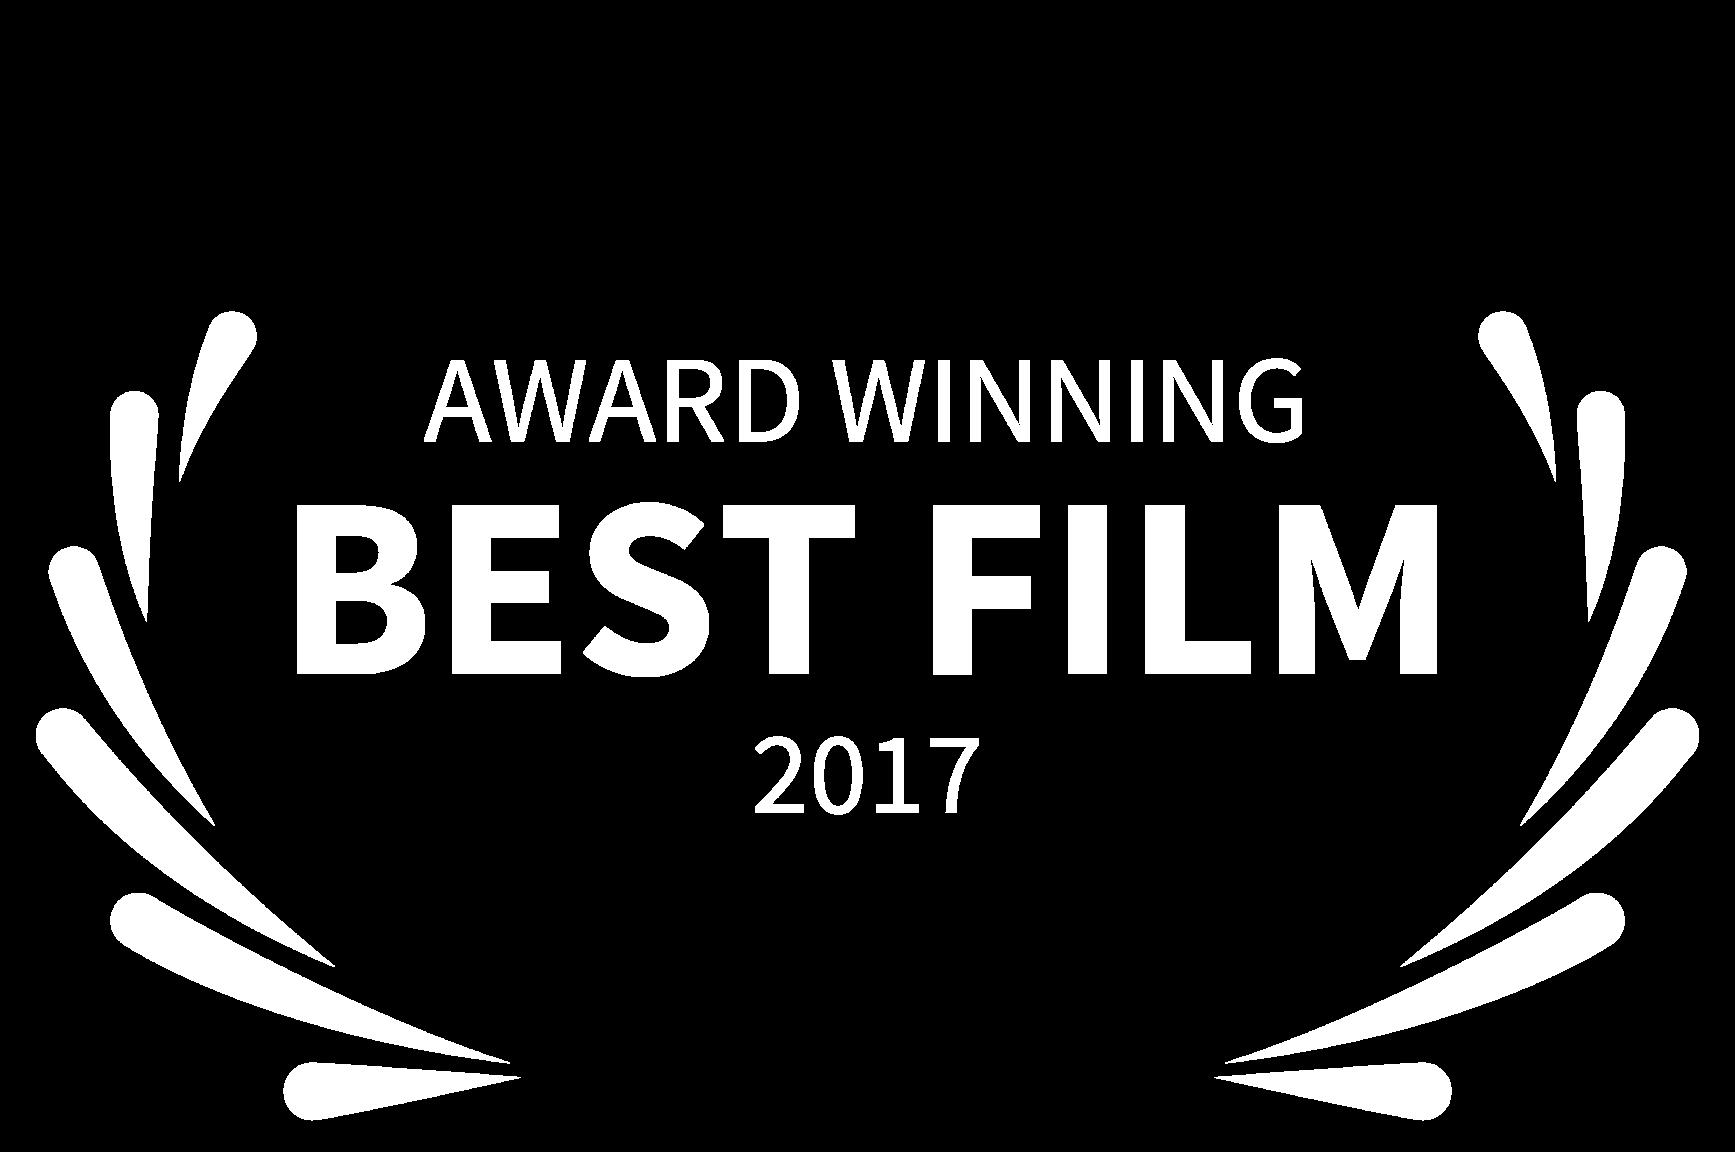 AWARD WINNING - BEST FILM - 2017.png